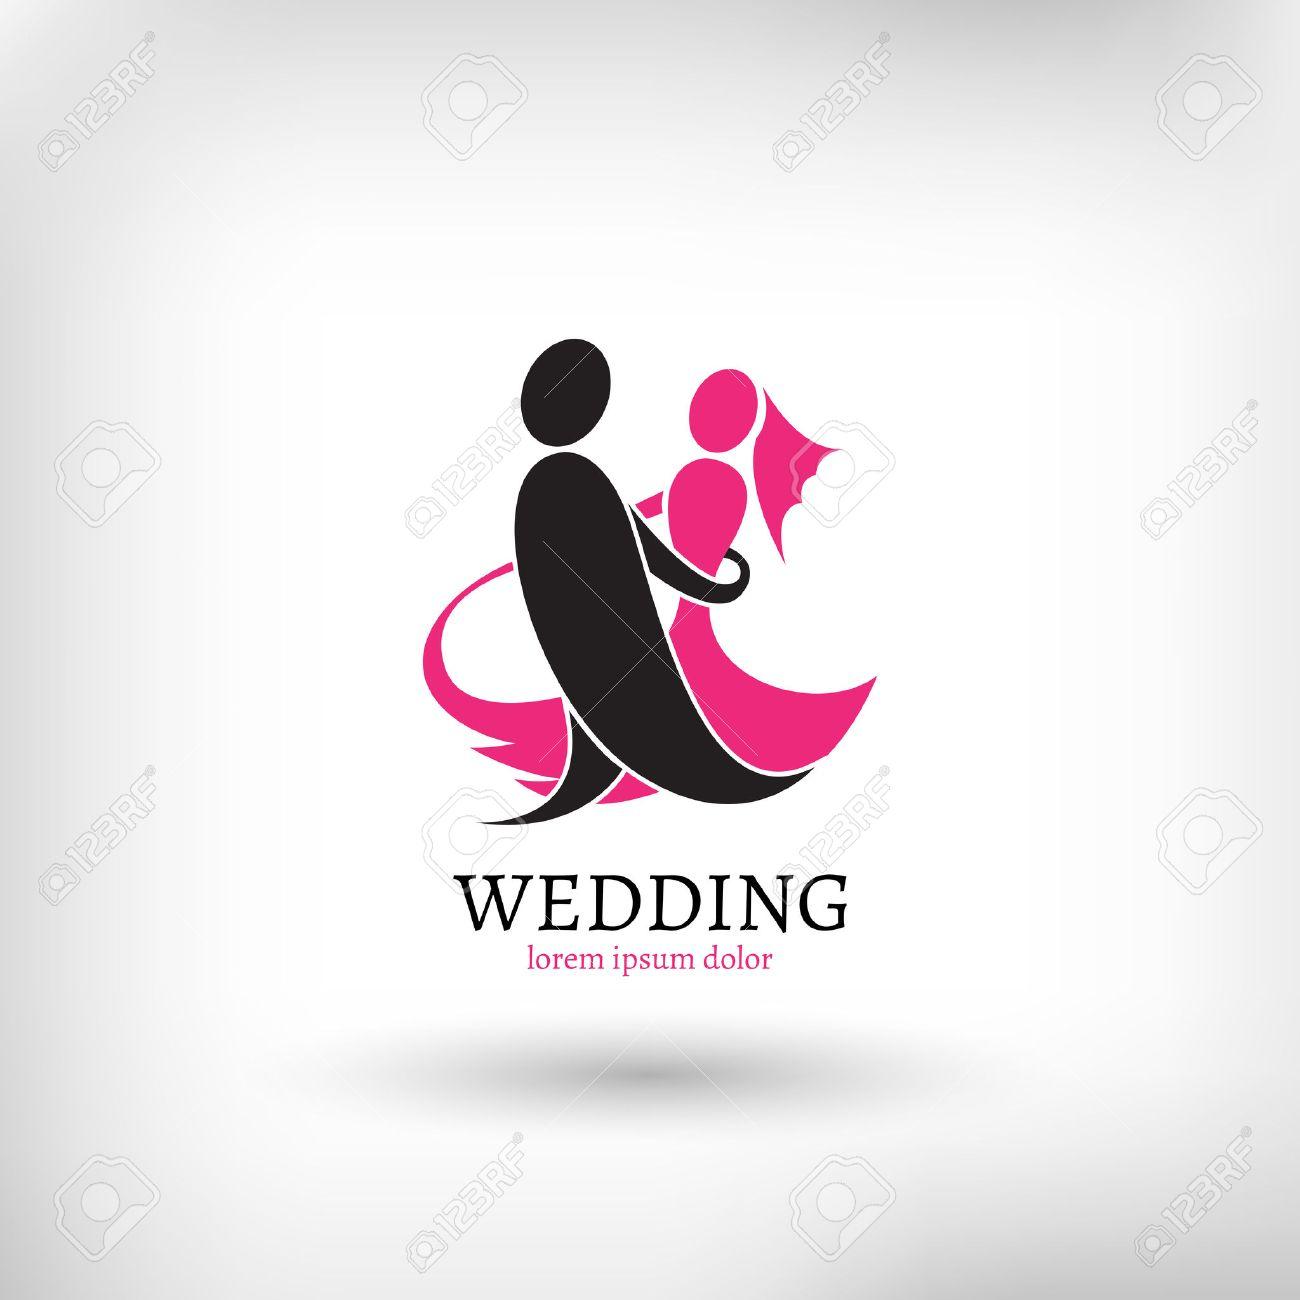 Vector wedding logo design template, marriage couple ceremony symbol - 46601258